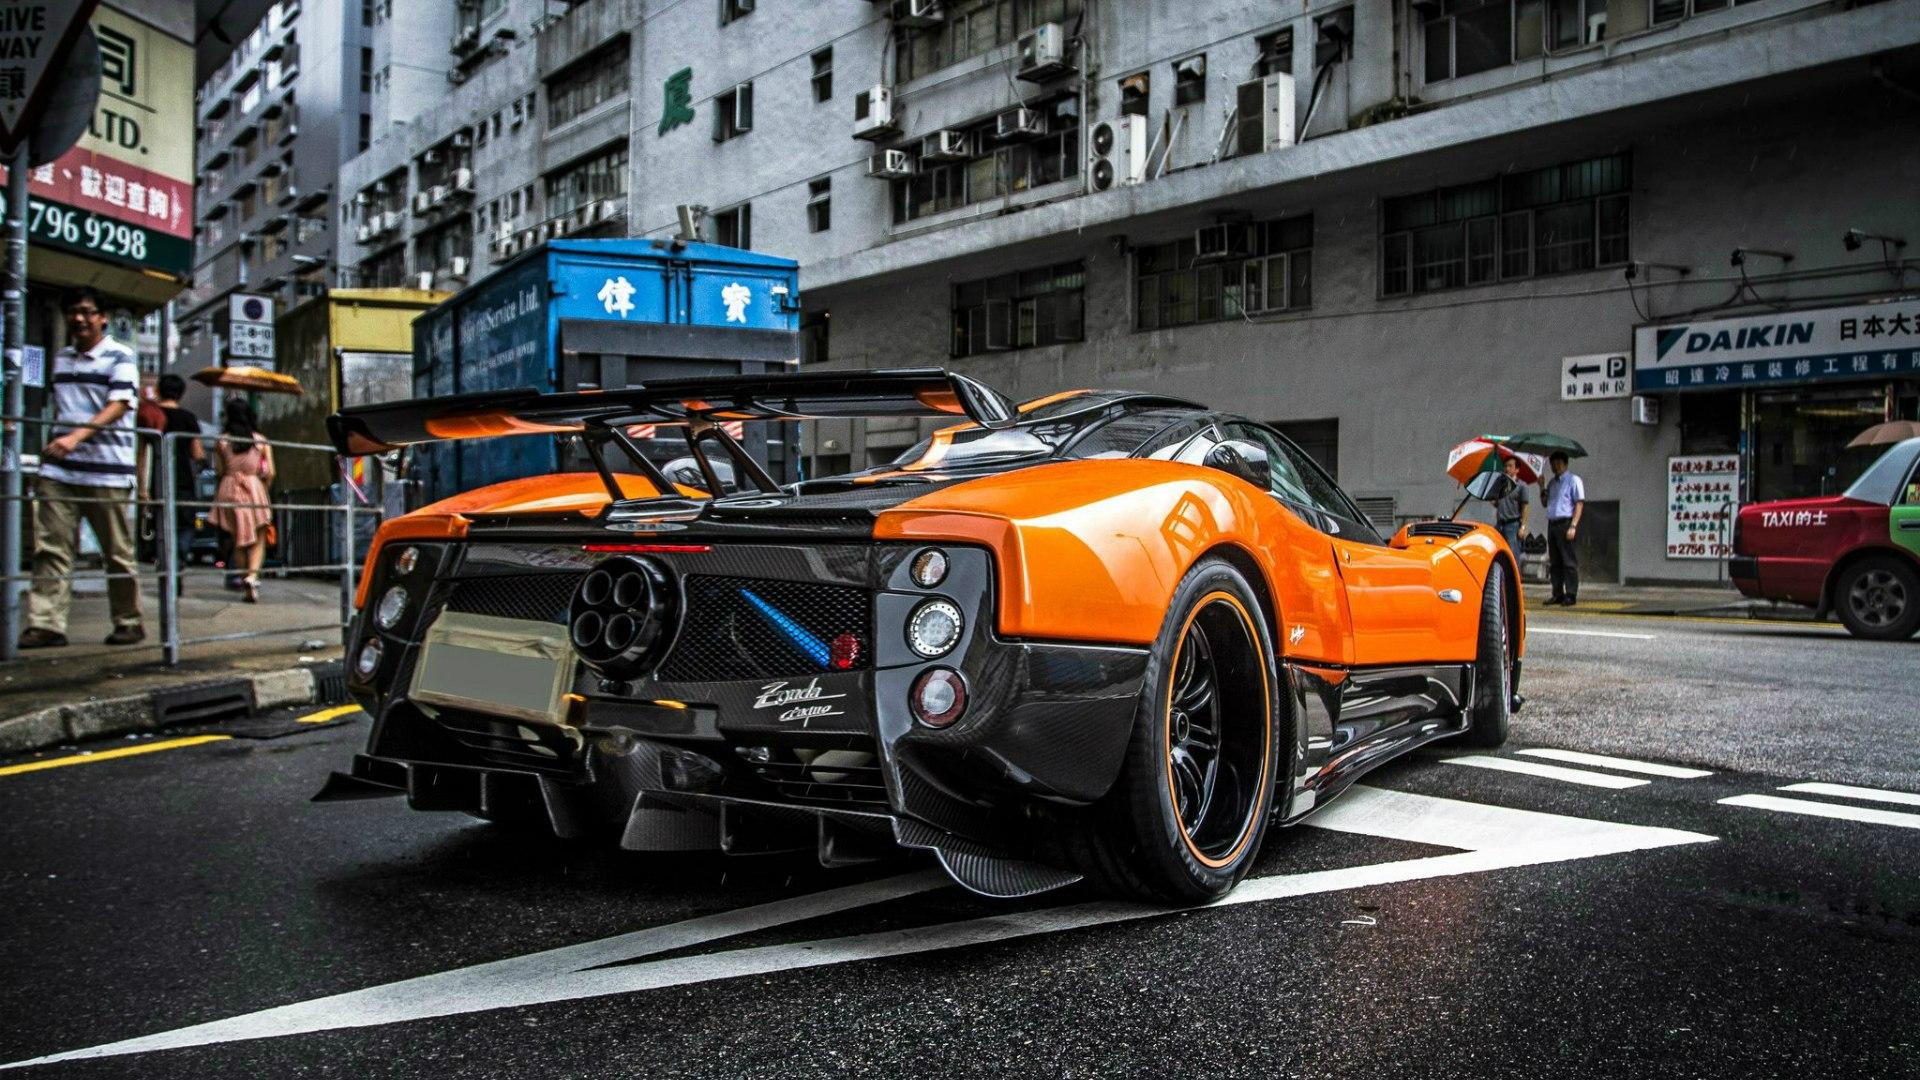 Pagani Zonda R Hd Wallpaper Pagani Zonda Hd Cars 4k Wallpapers Images Backgrounds